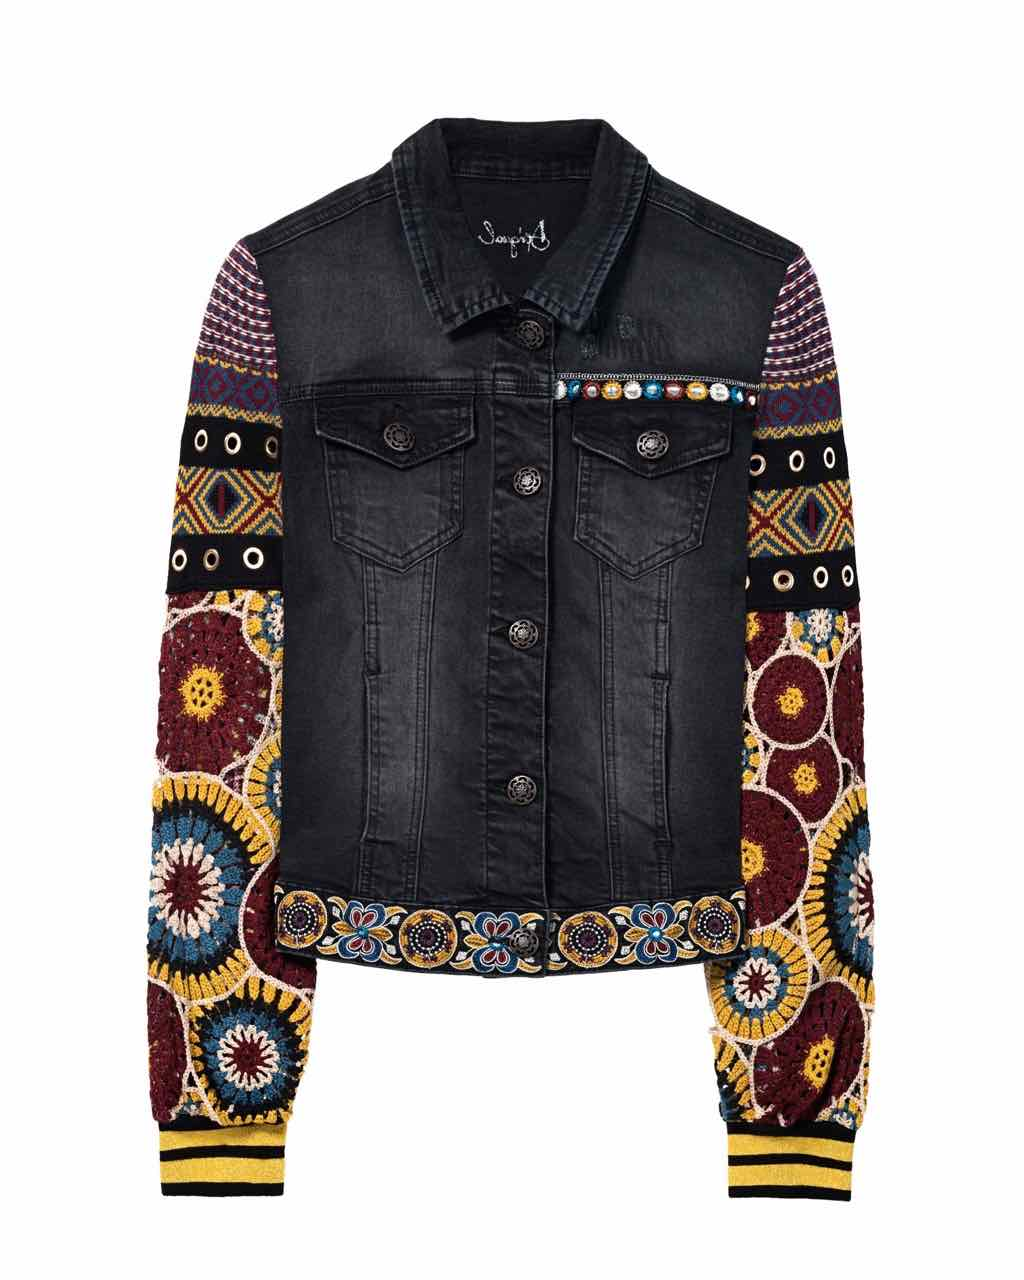 Desigual Denim Jacket Alessia 18swed19 Buy Online